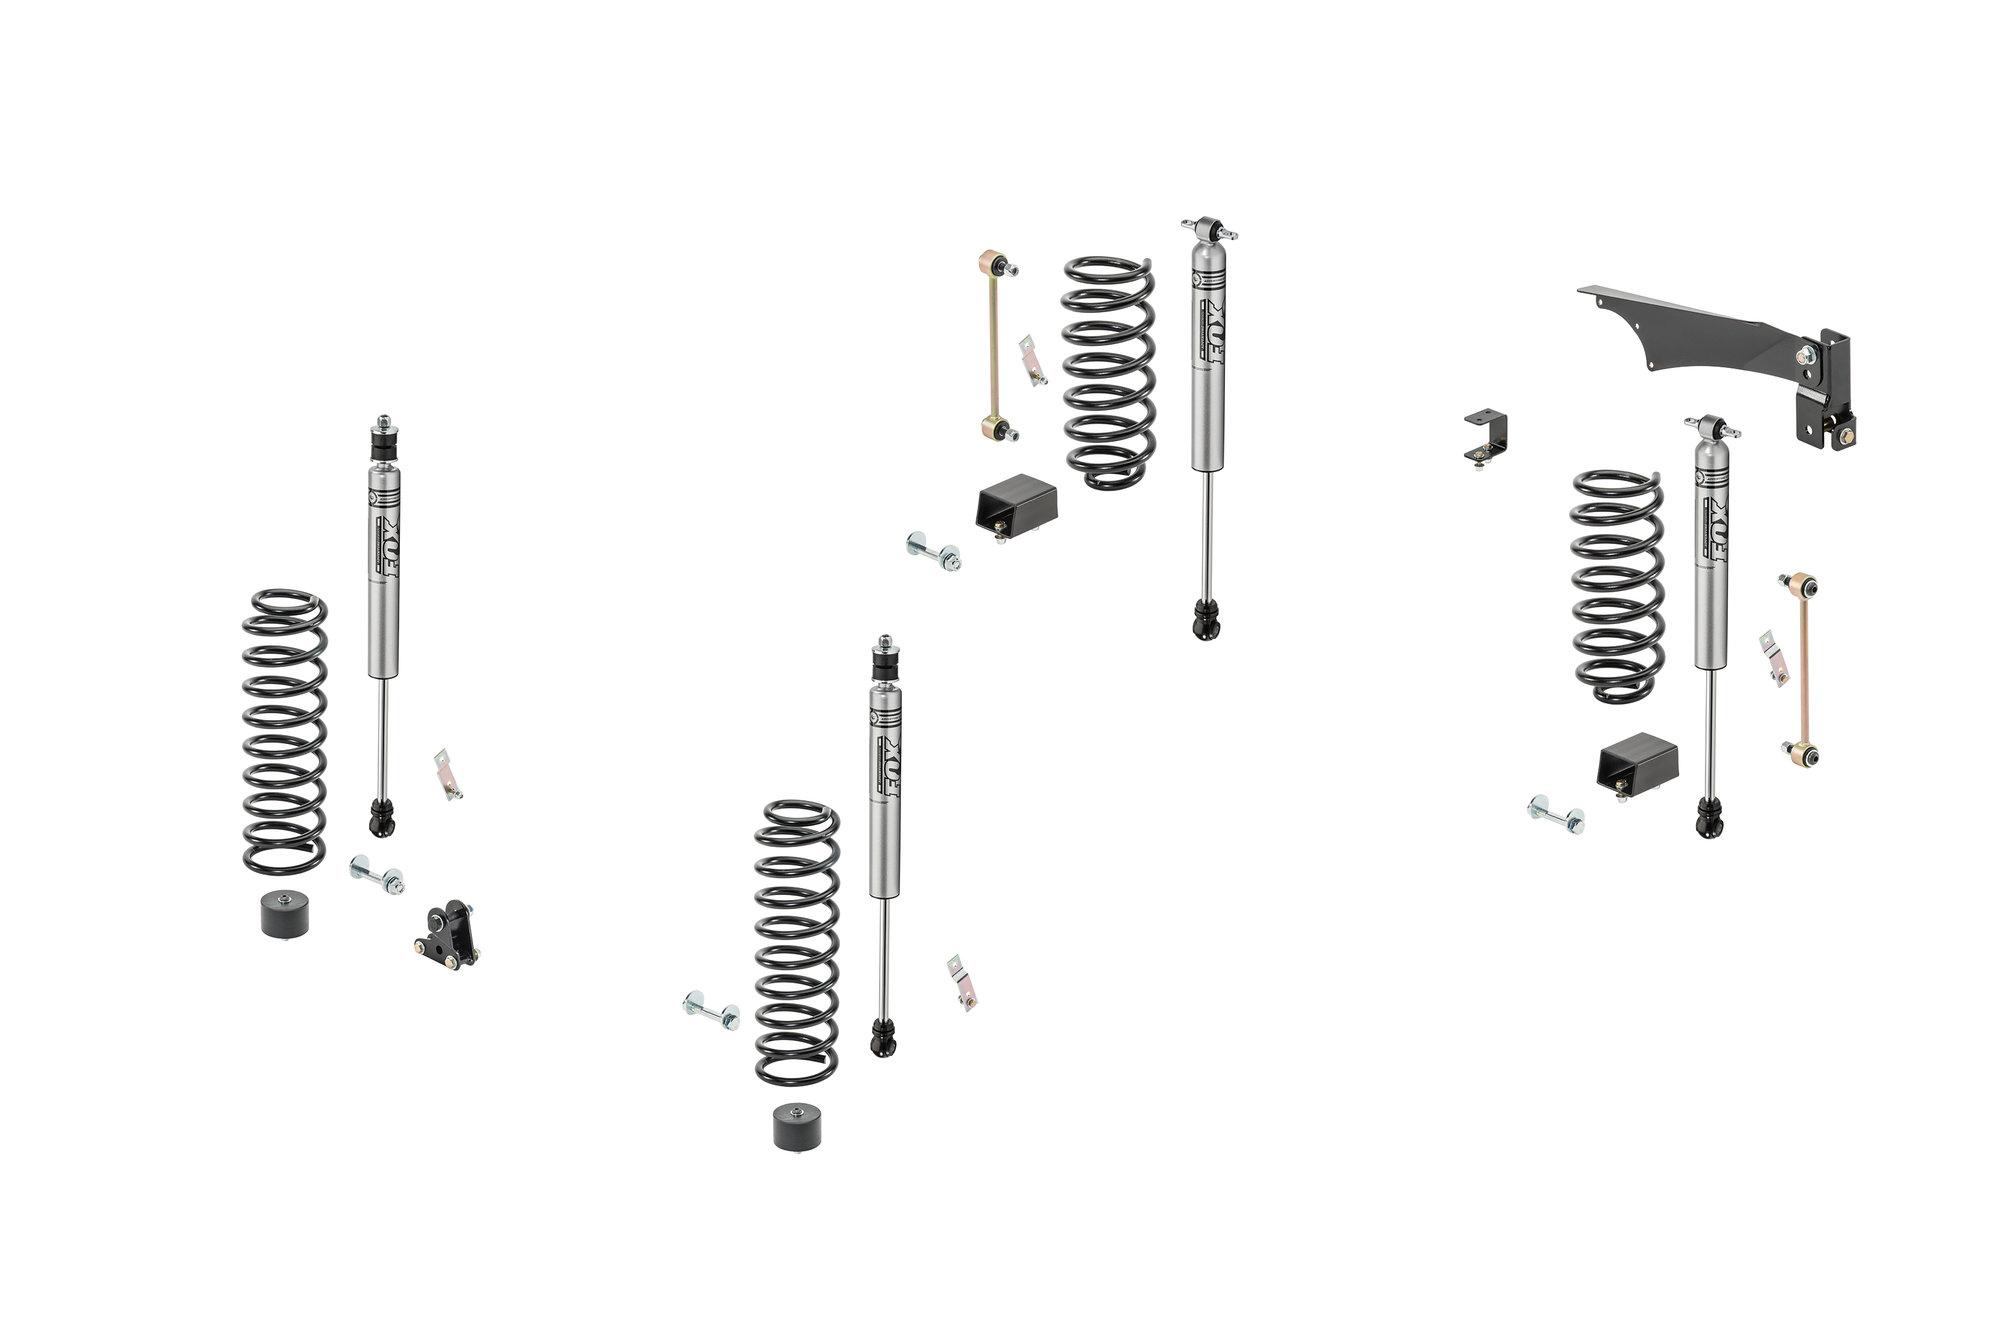 Quadratec 3 5 Coil Spring Suspension Kit With Fox Ifp Mono Tube Shocks For 07 18 Jeep Wrangler